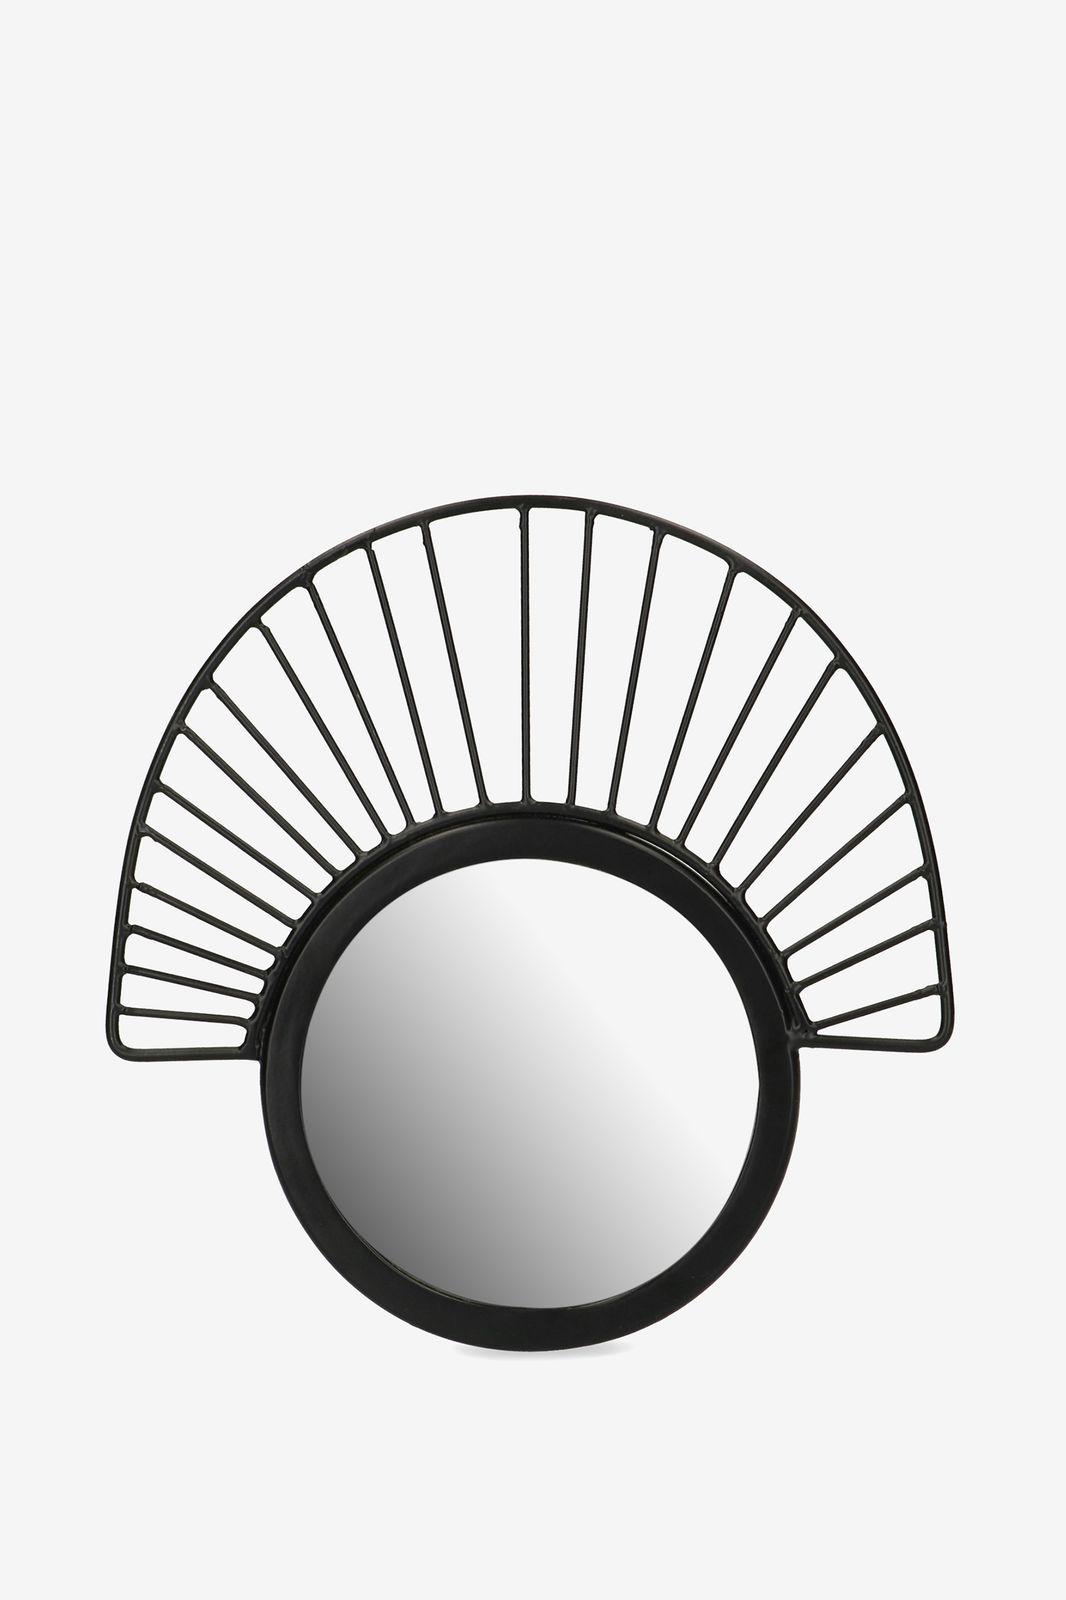 Zwarte hangspiegel oog - Homeland | Sissy-Boy